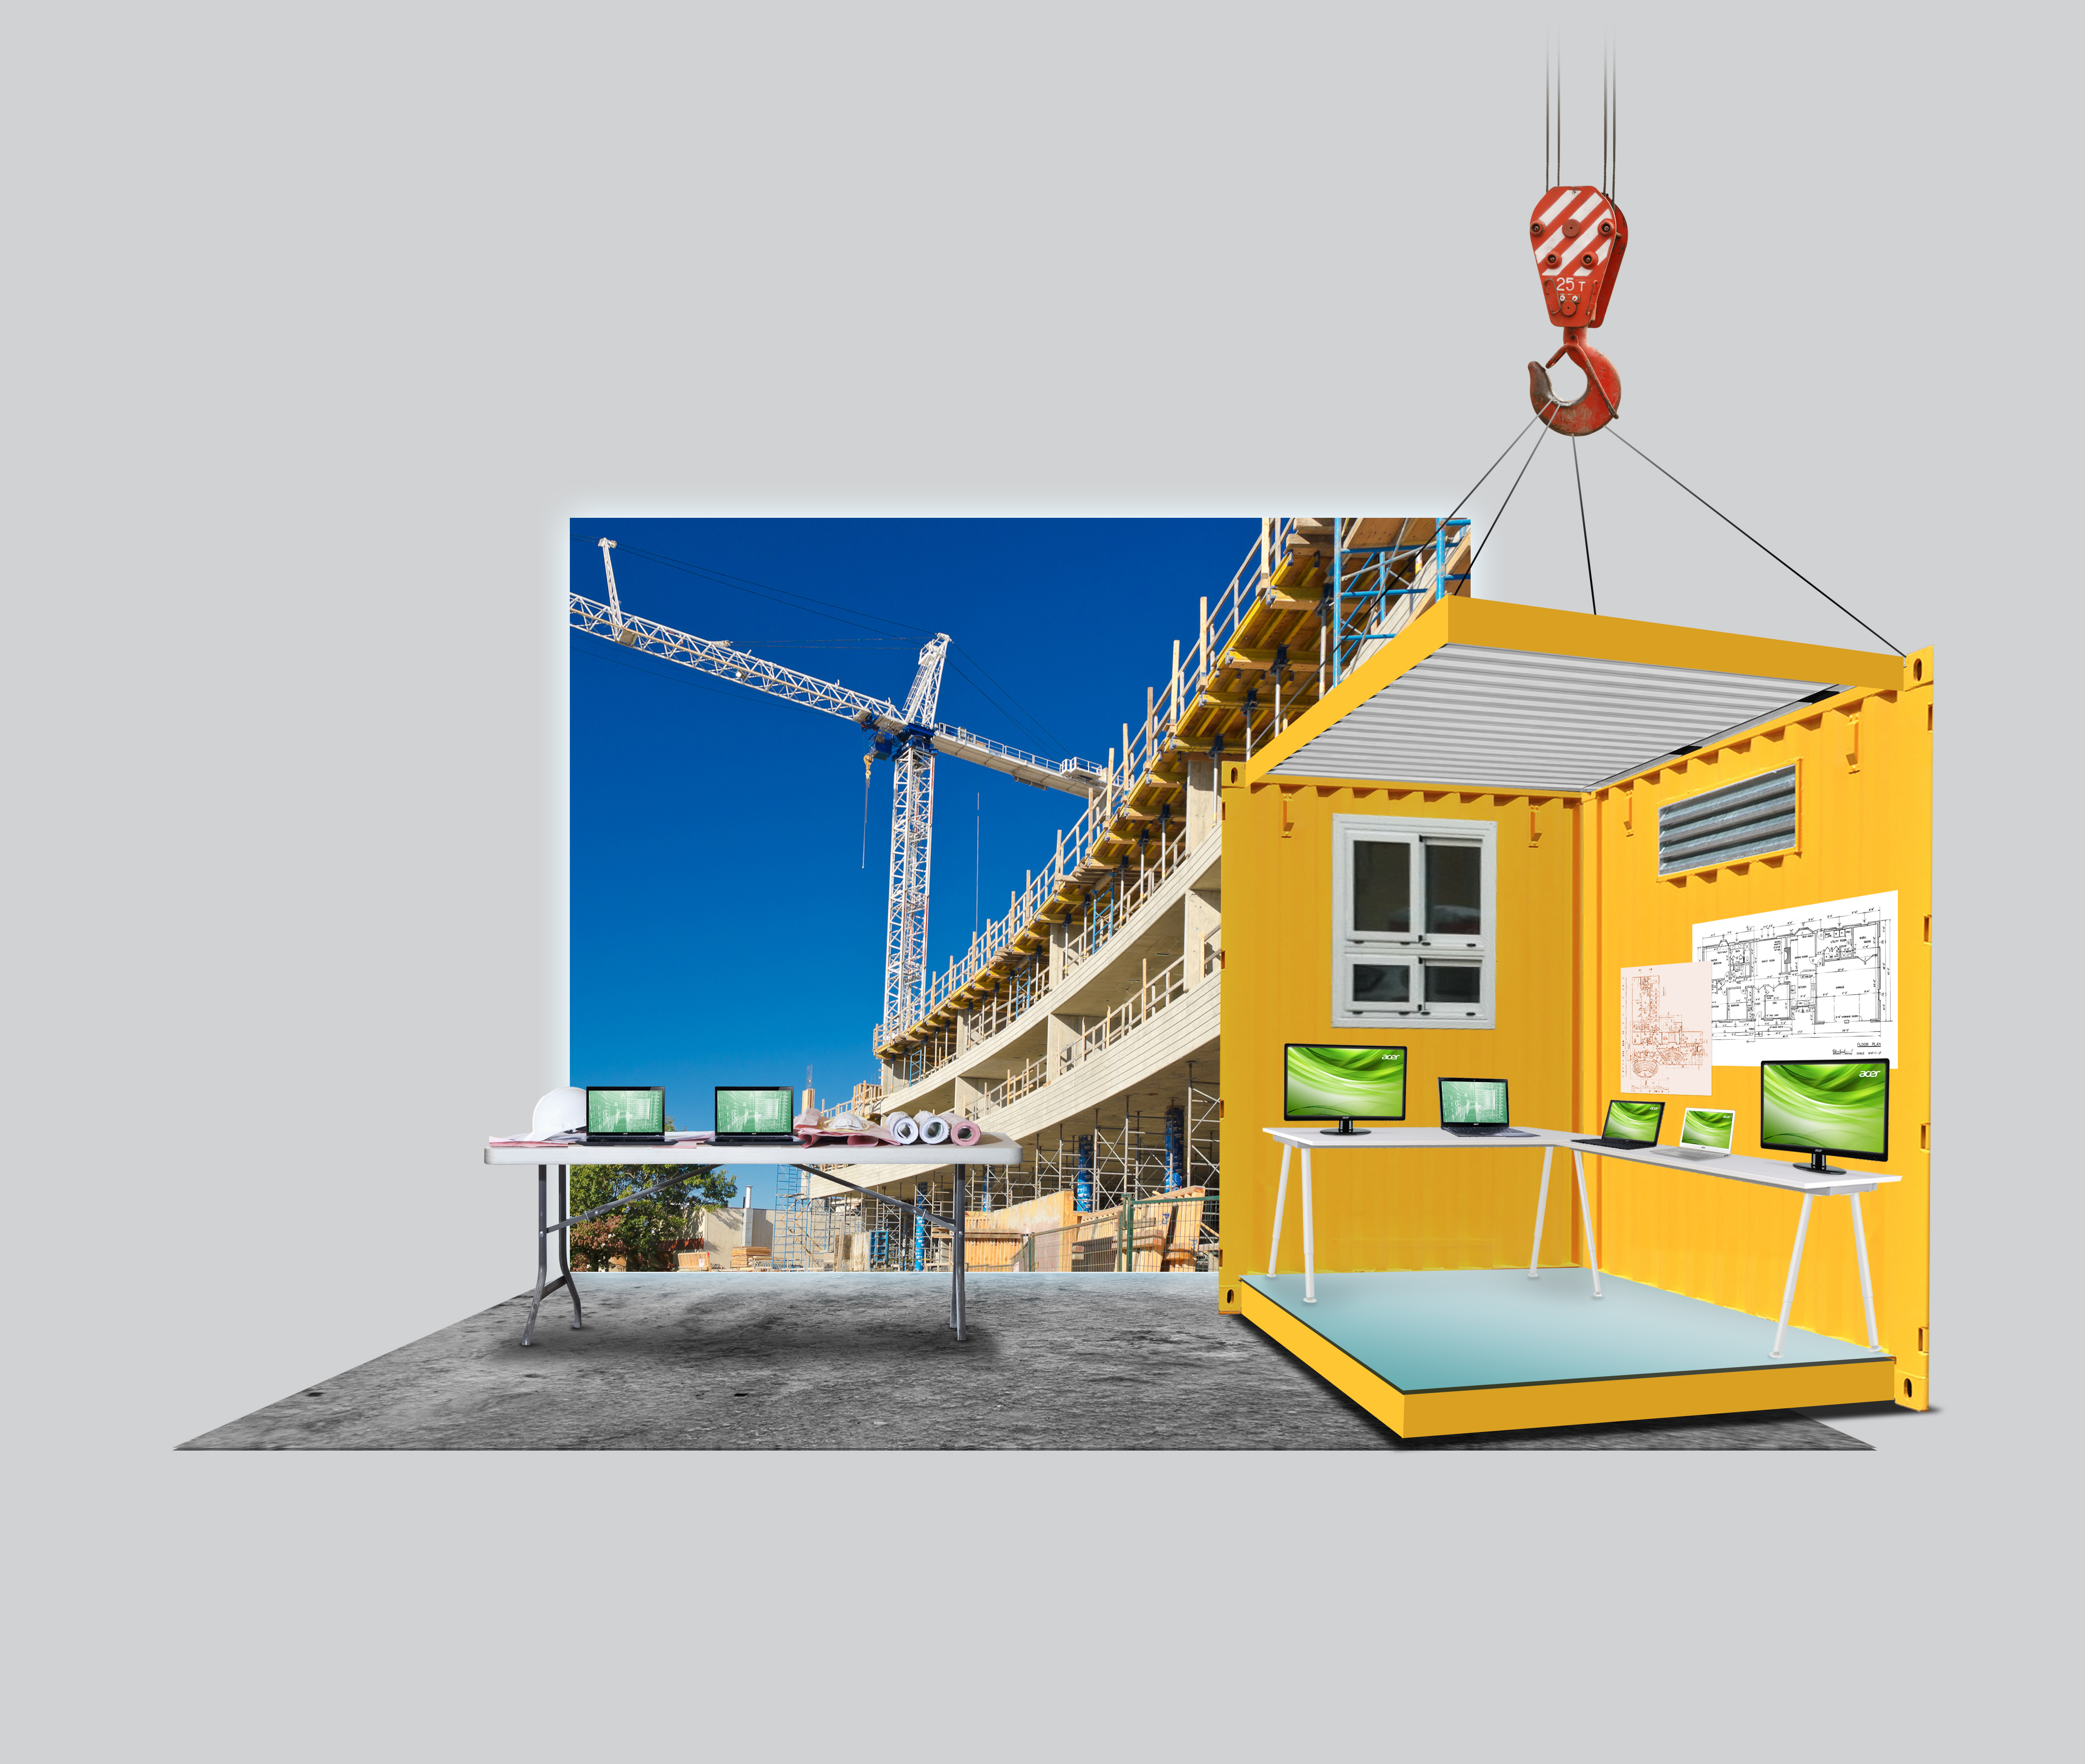 Acer / Building Yard